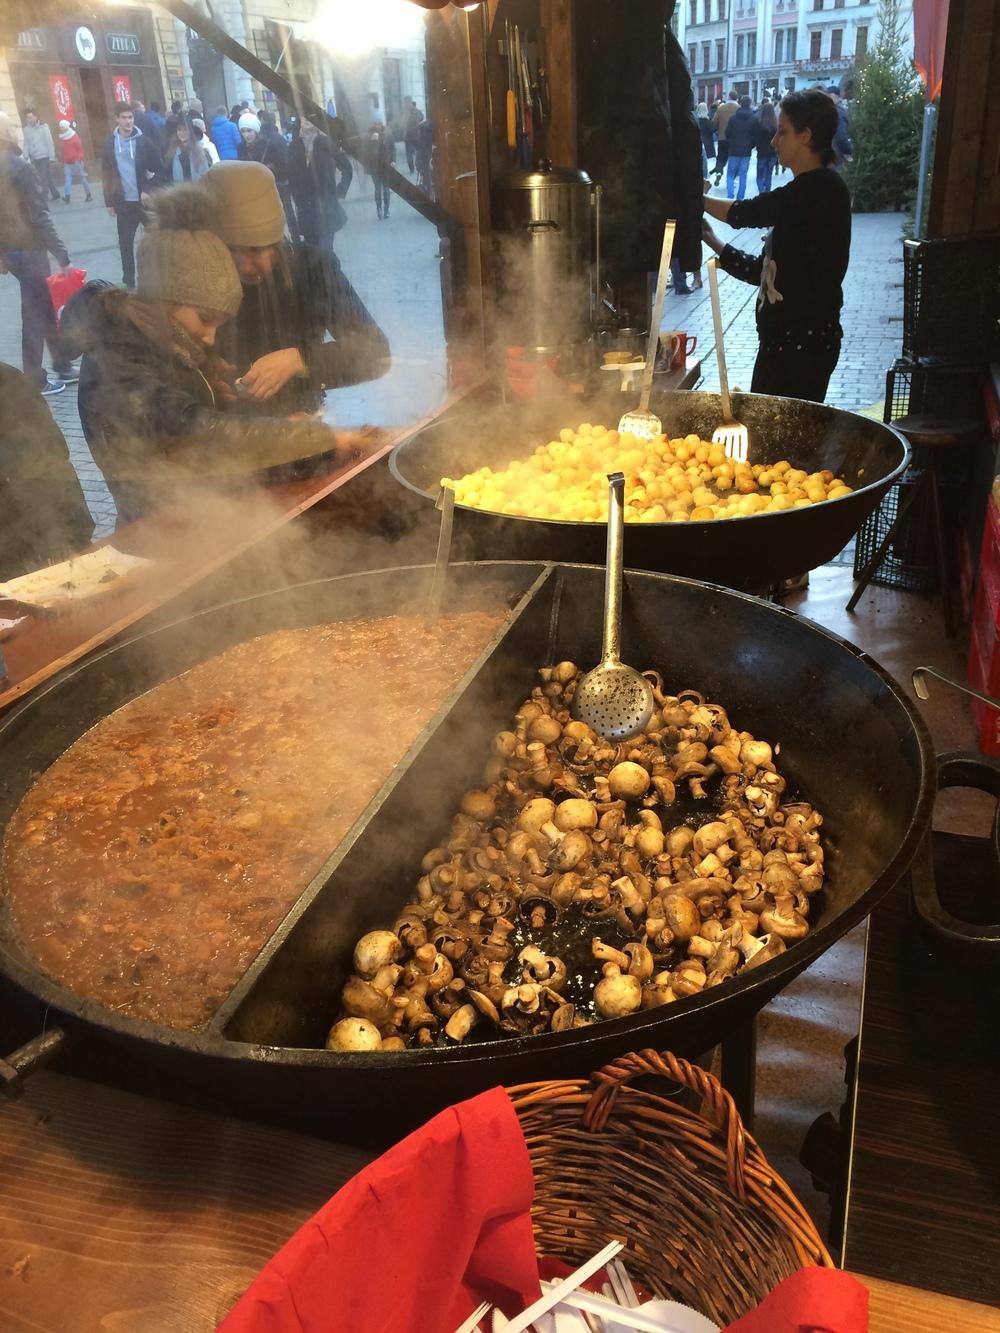 Krakow Christmas markets: Sauteed potatoes, mushrooms, and sauerkraut soup